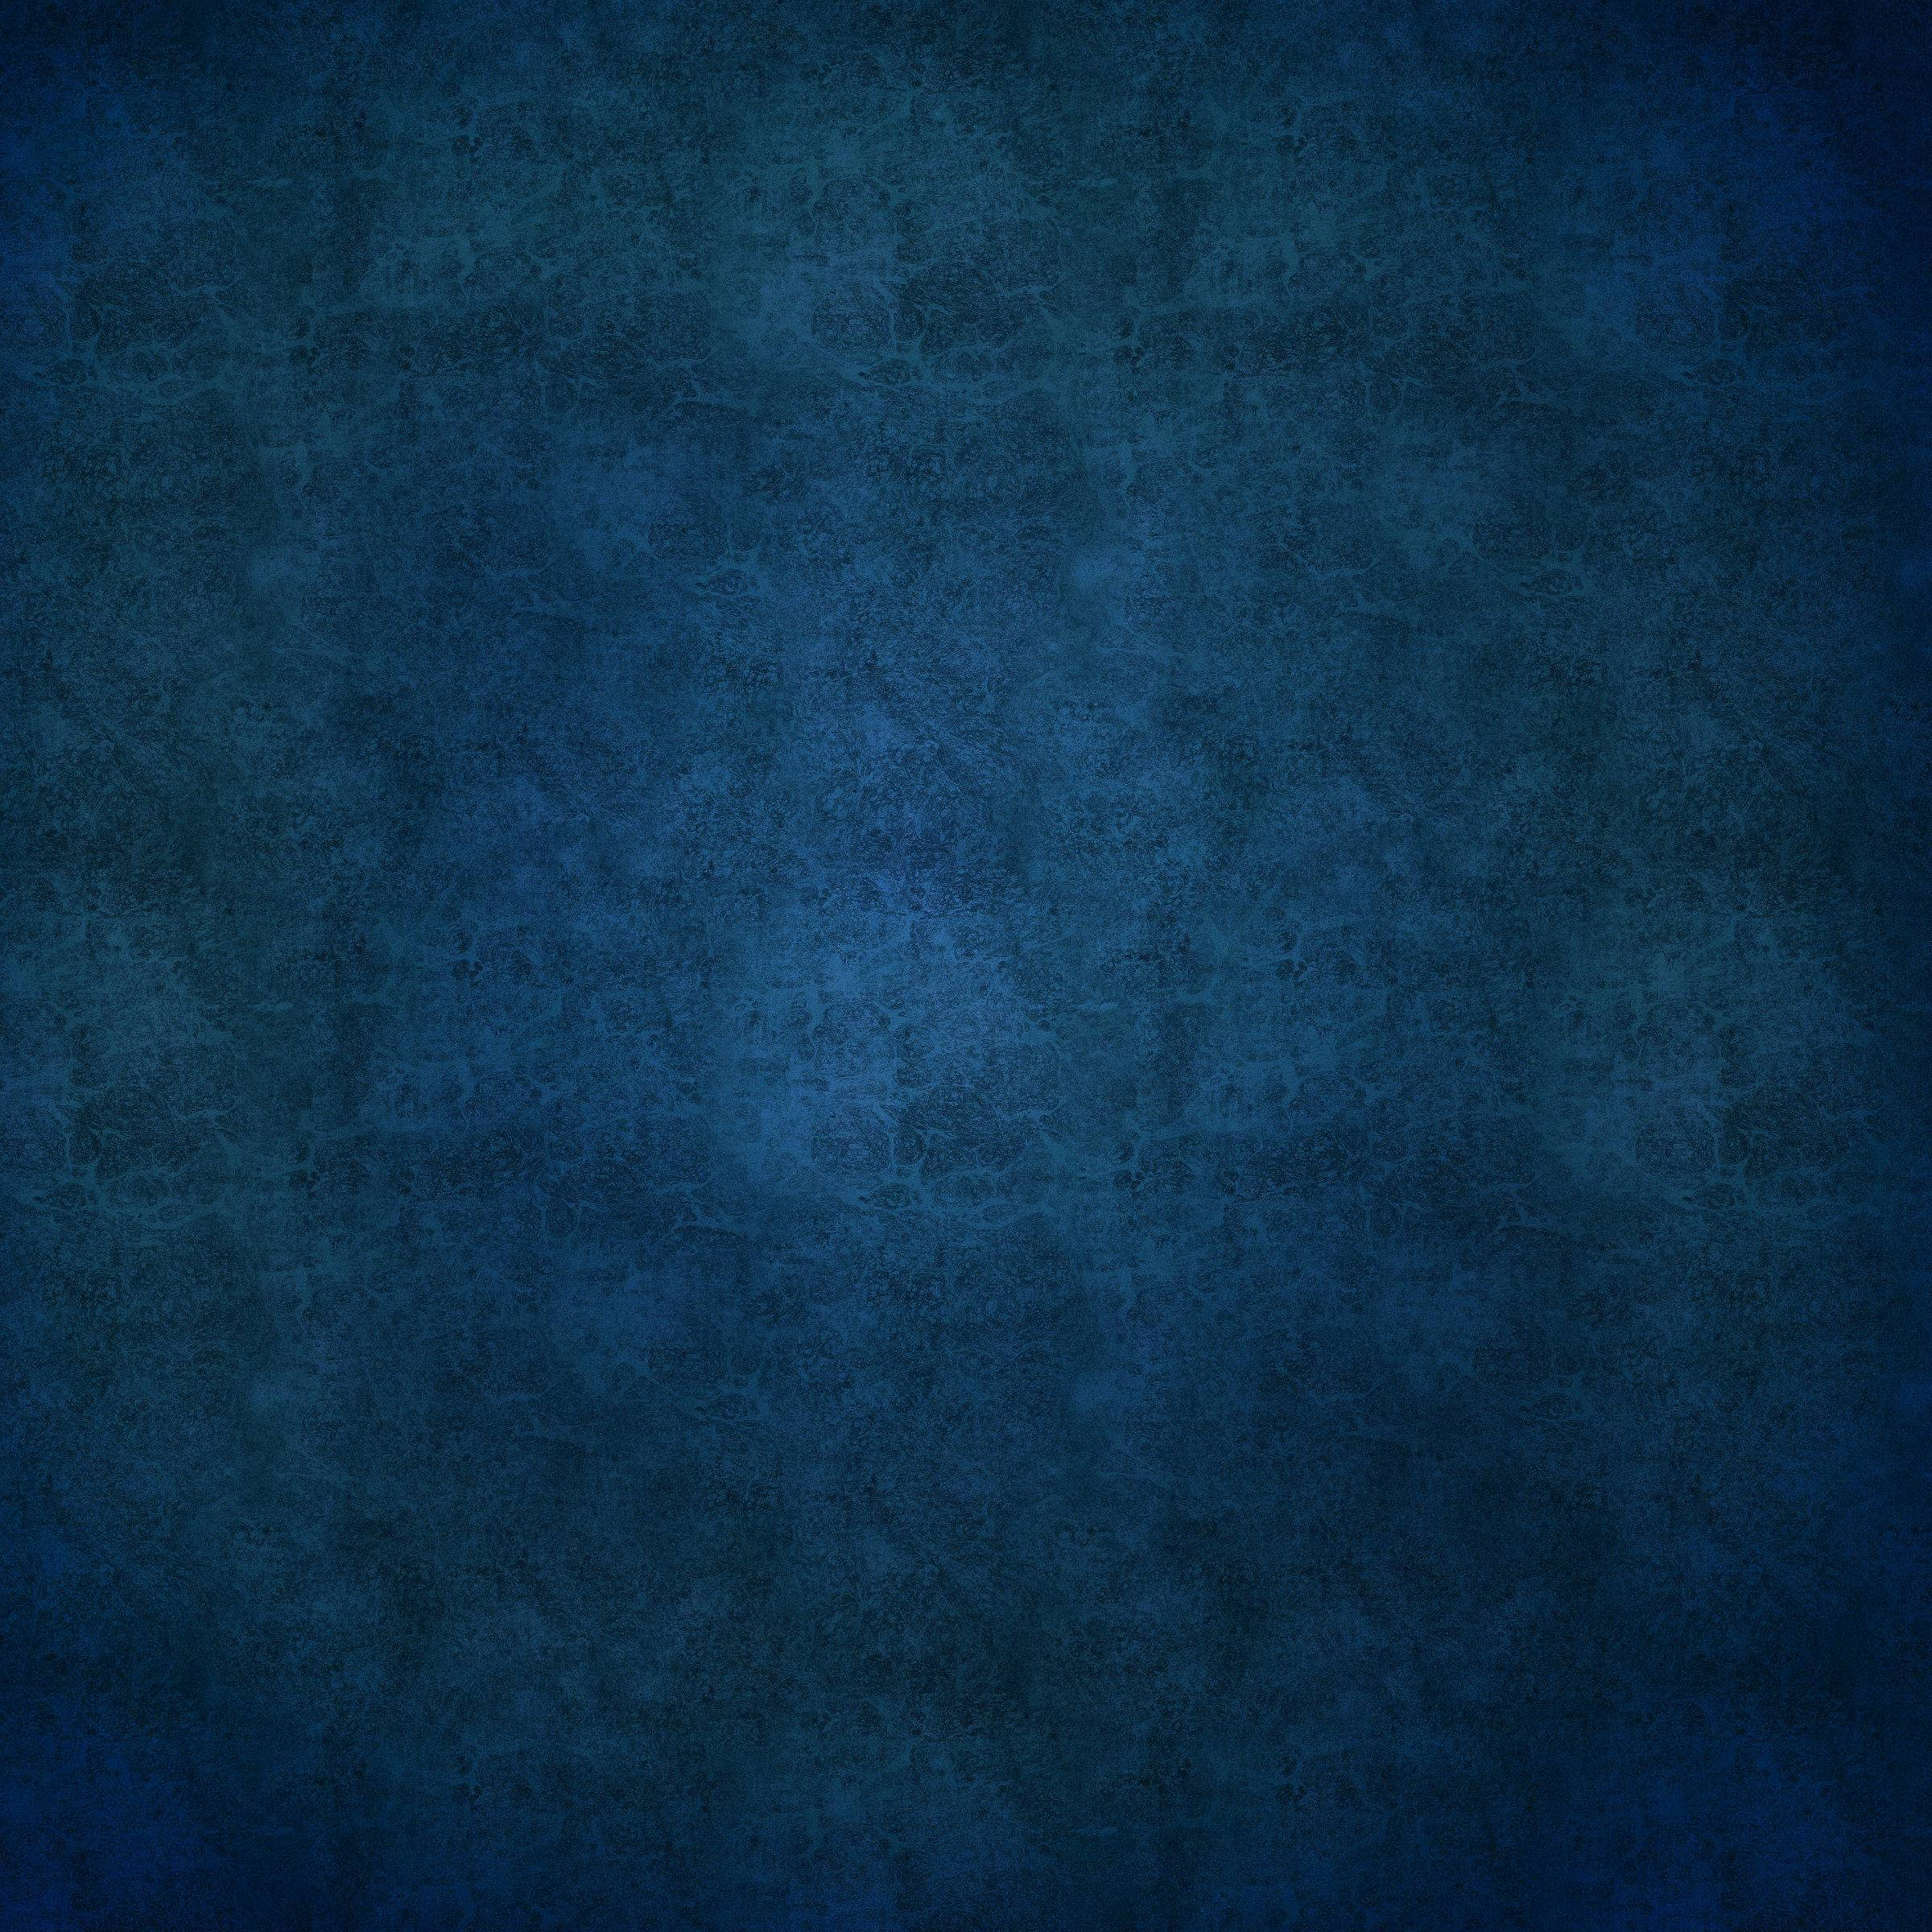 royal blue wallpaper tumblr - photo #17